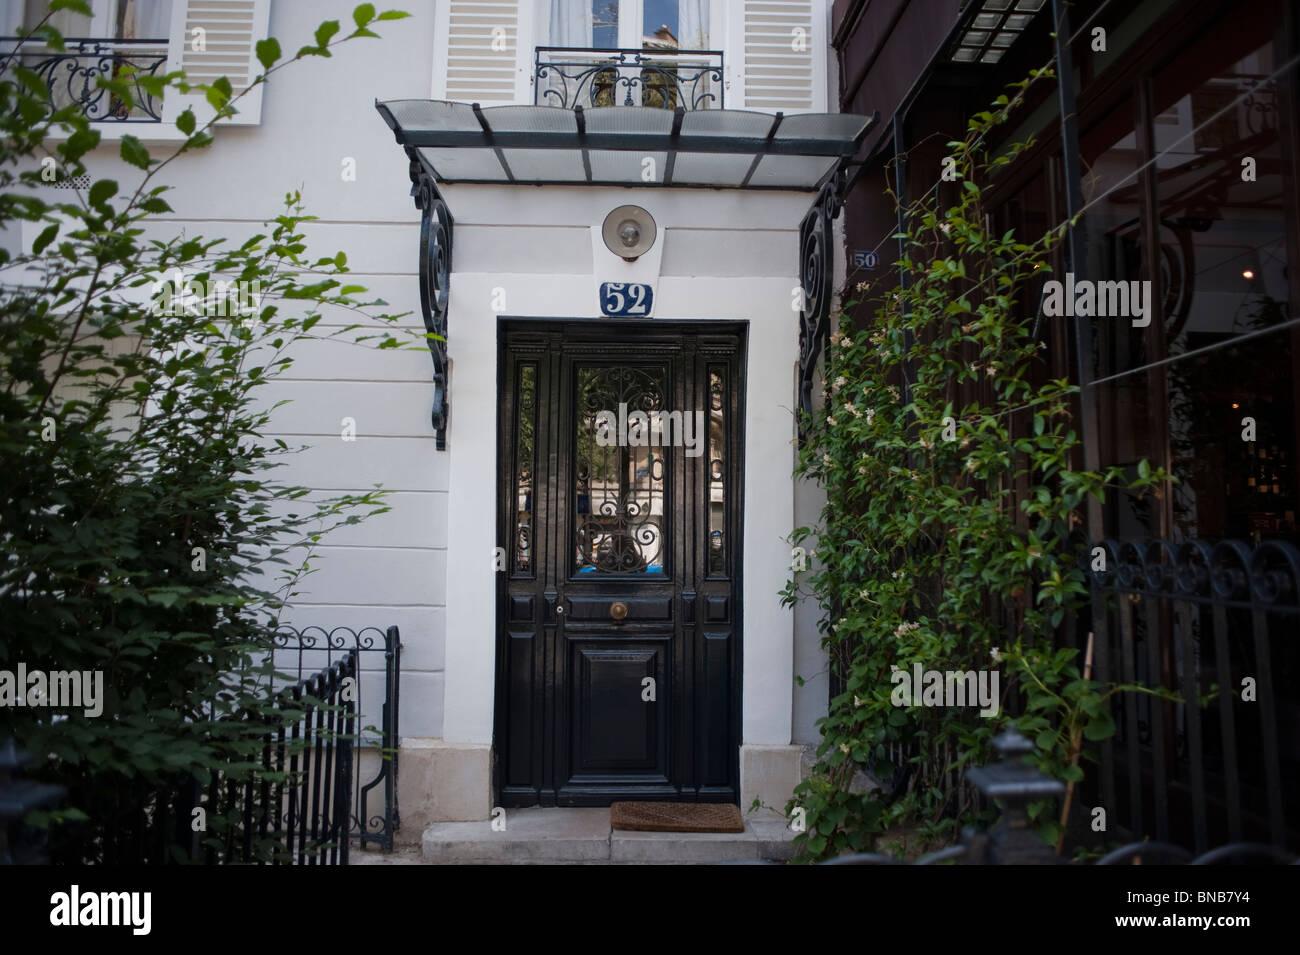 Parisian Apartment Building Front Entrance Door Stock Photos ...